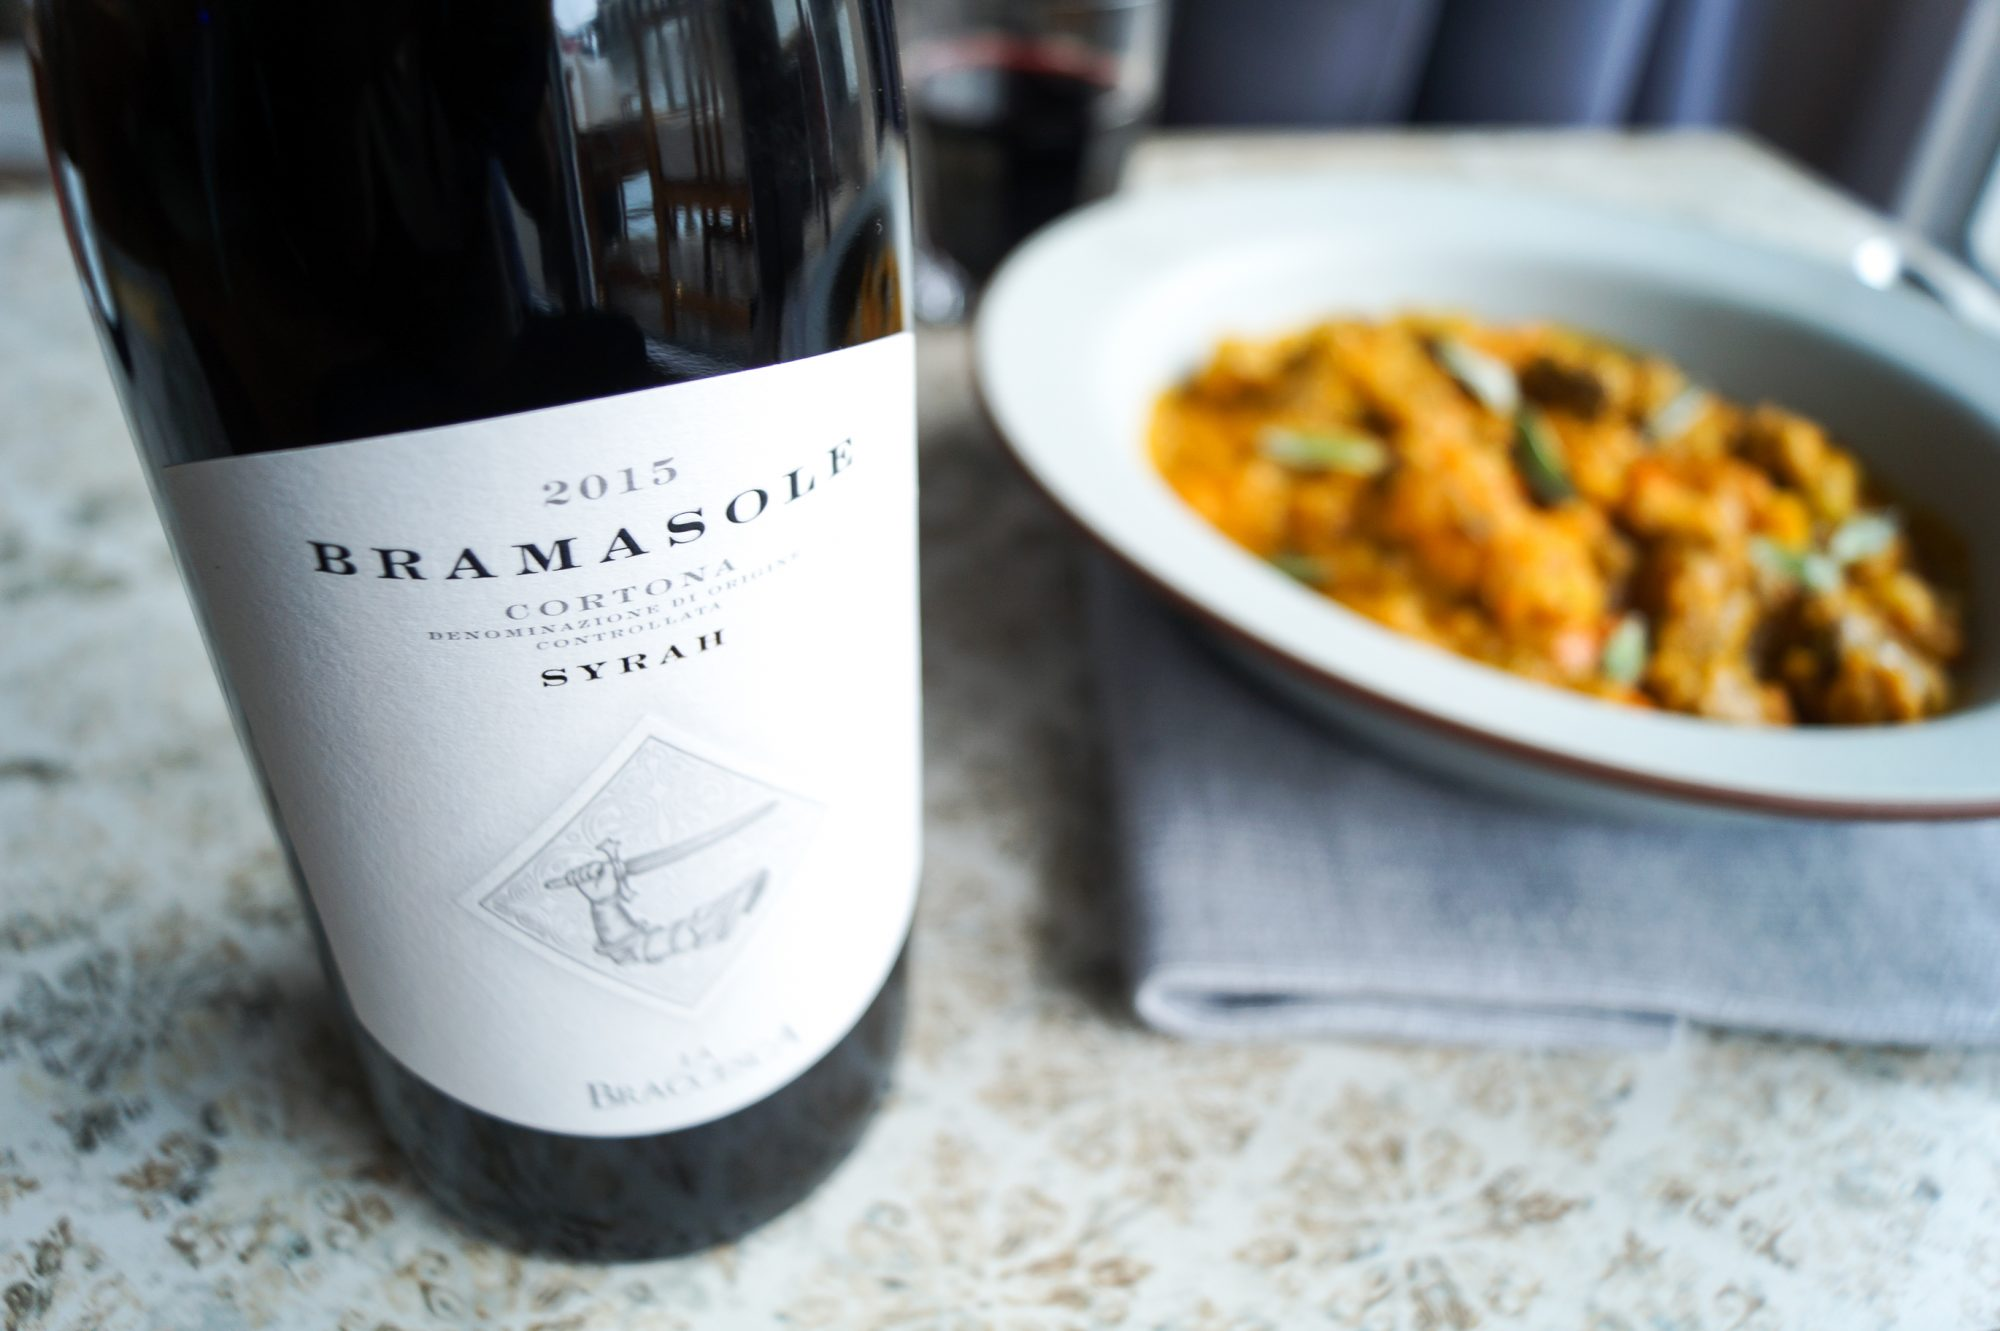 Wein des Monats Dezember Bramasole Cortona DOC Syrah 2011